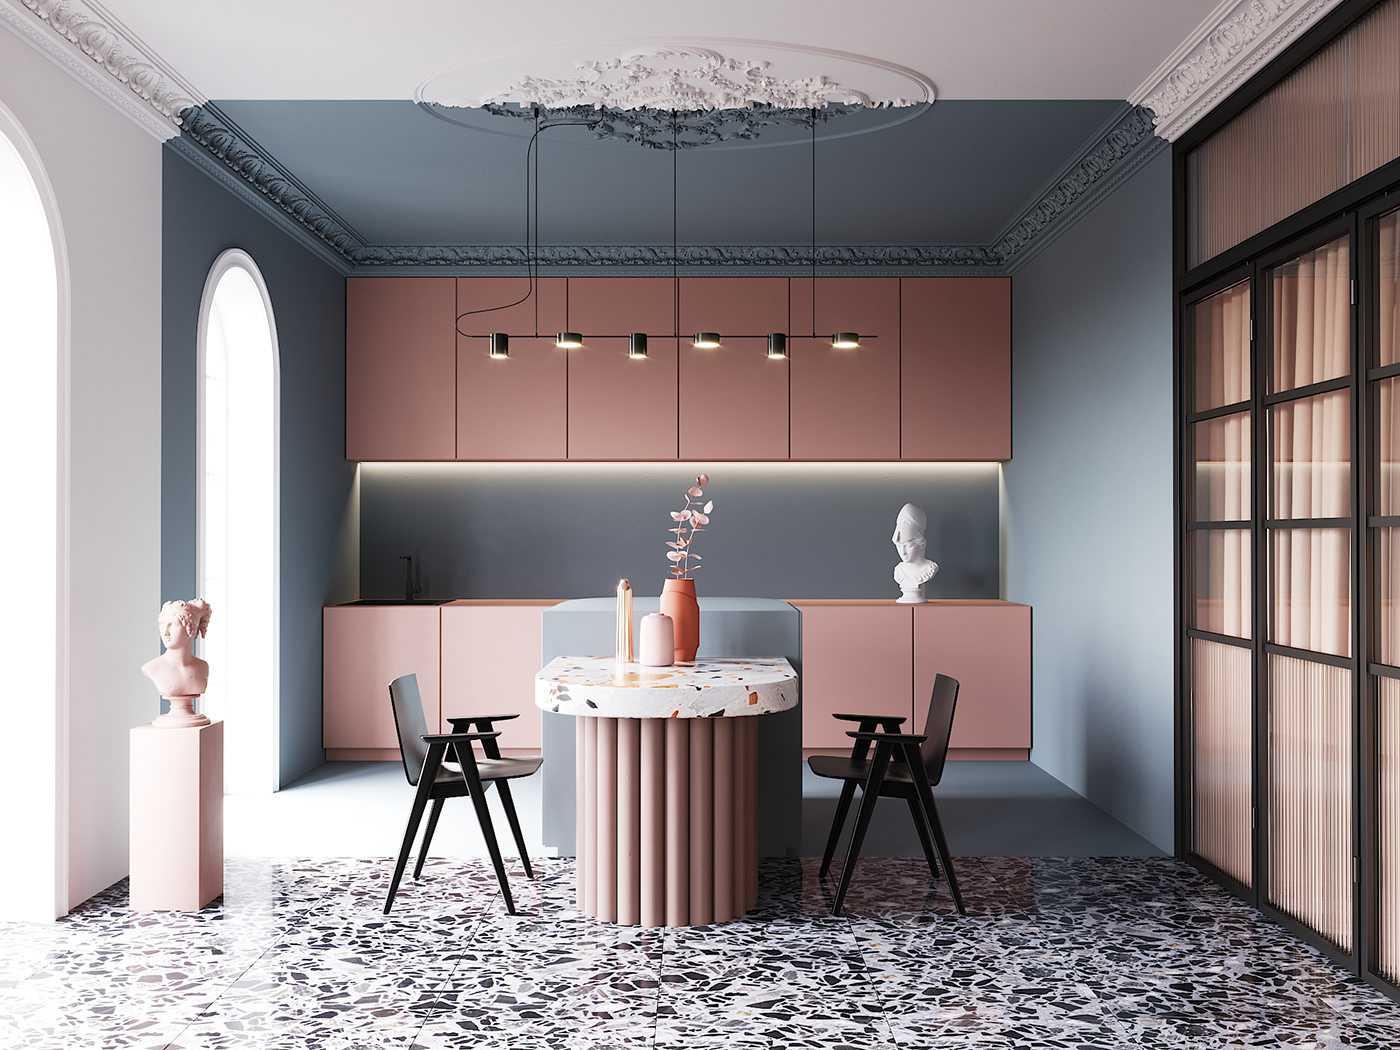 2019's Biggest Interior Design Predictions From Top Designers